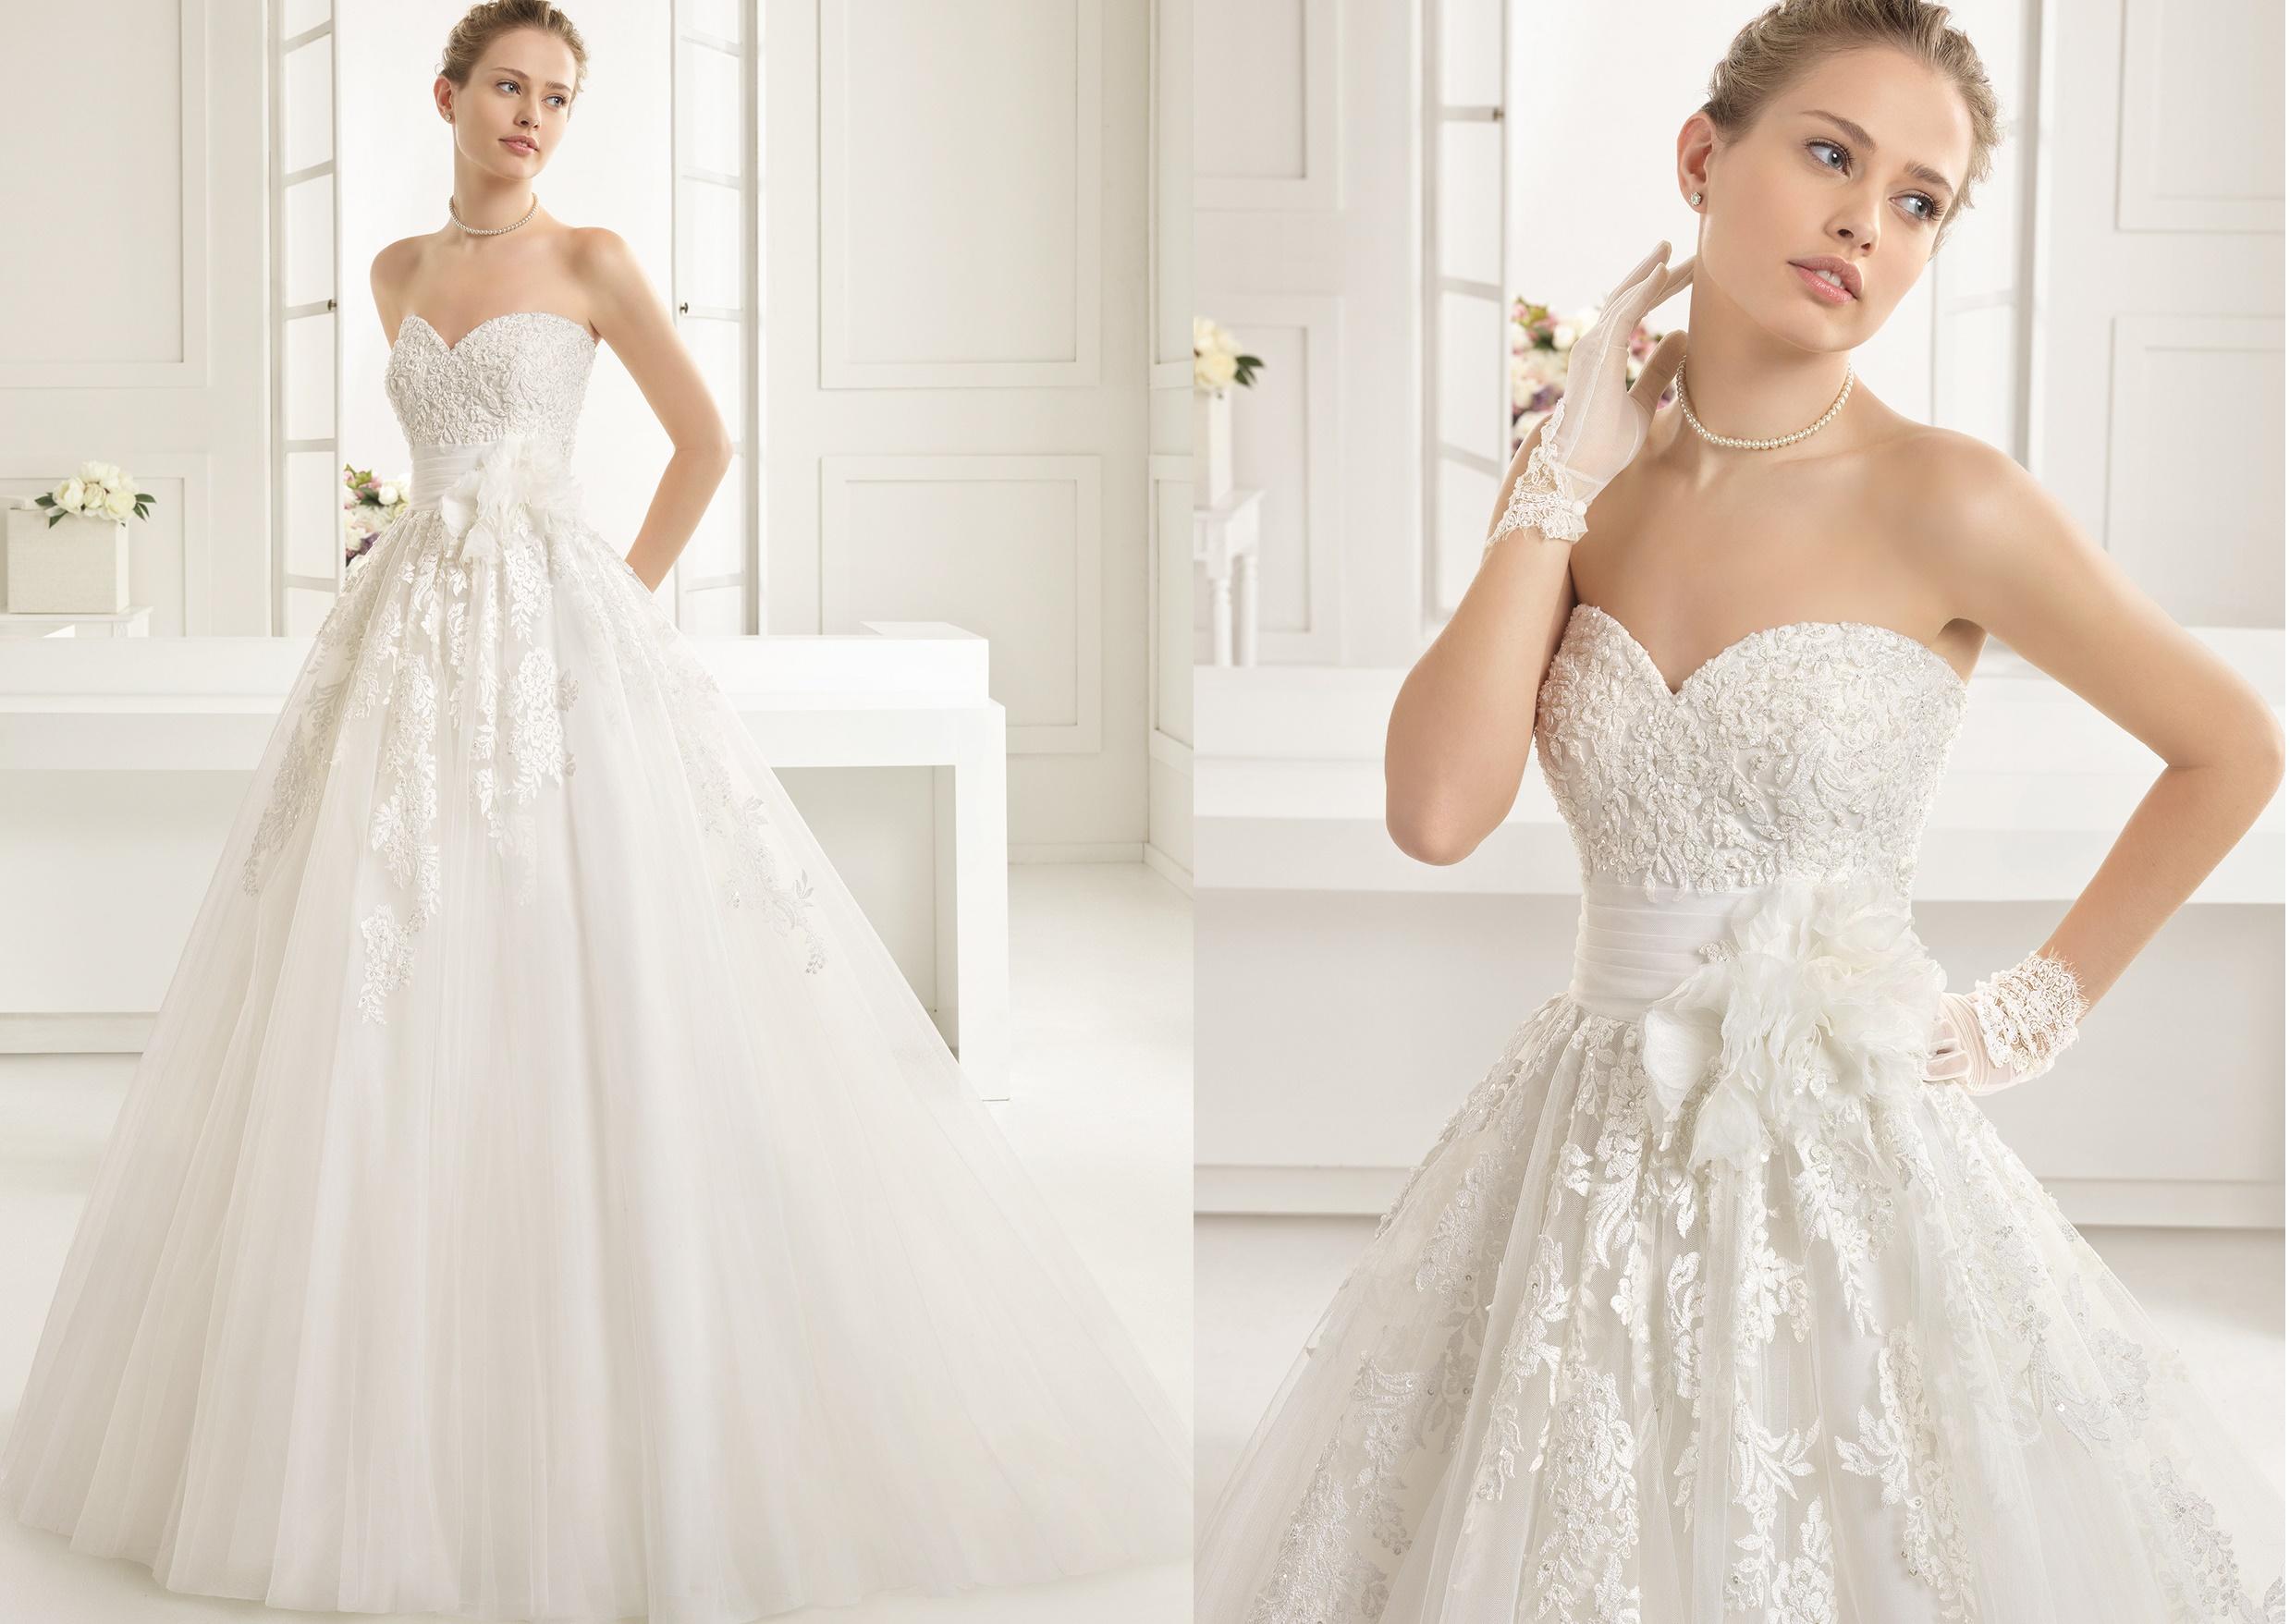 Rosa Clará16 - Vestidos de Noiva - Bridal Collection 2016